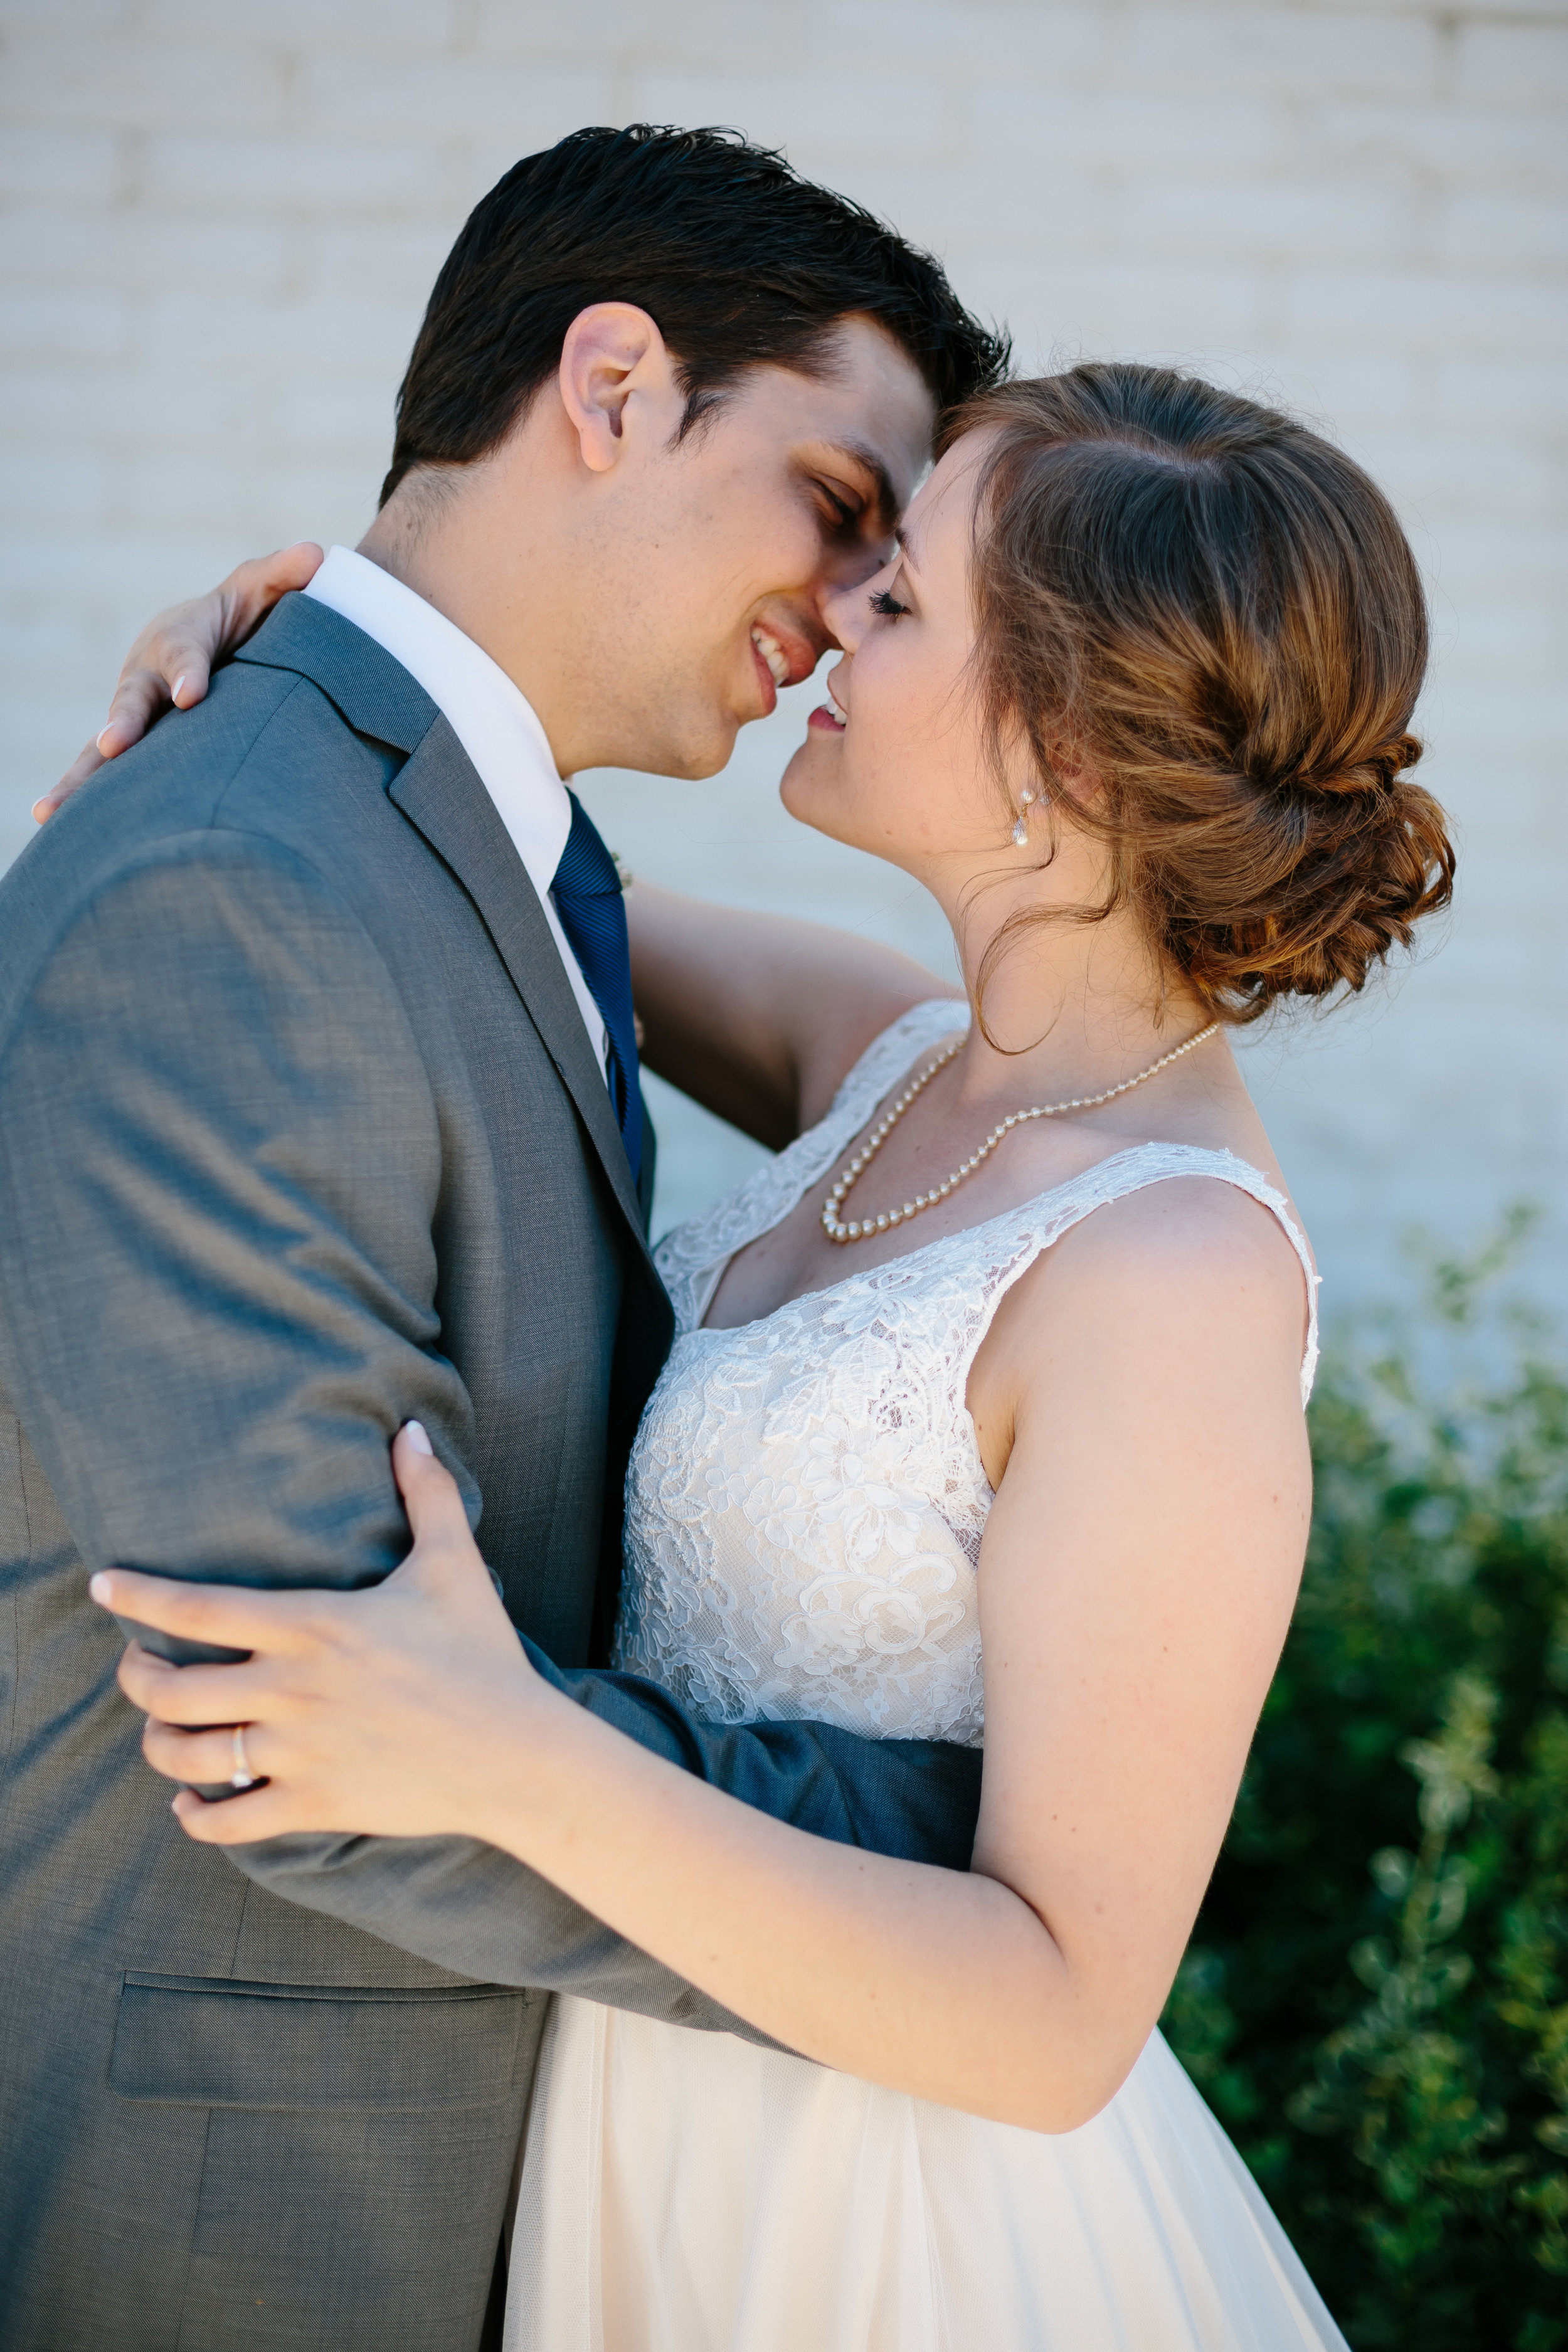 Jordan & Shantel Married - Idaho - Corrie Mick Photography-174.jpg